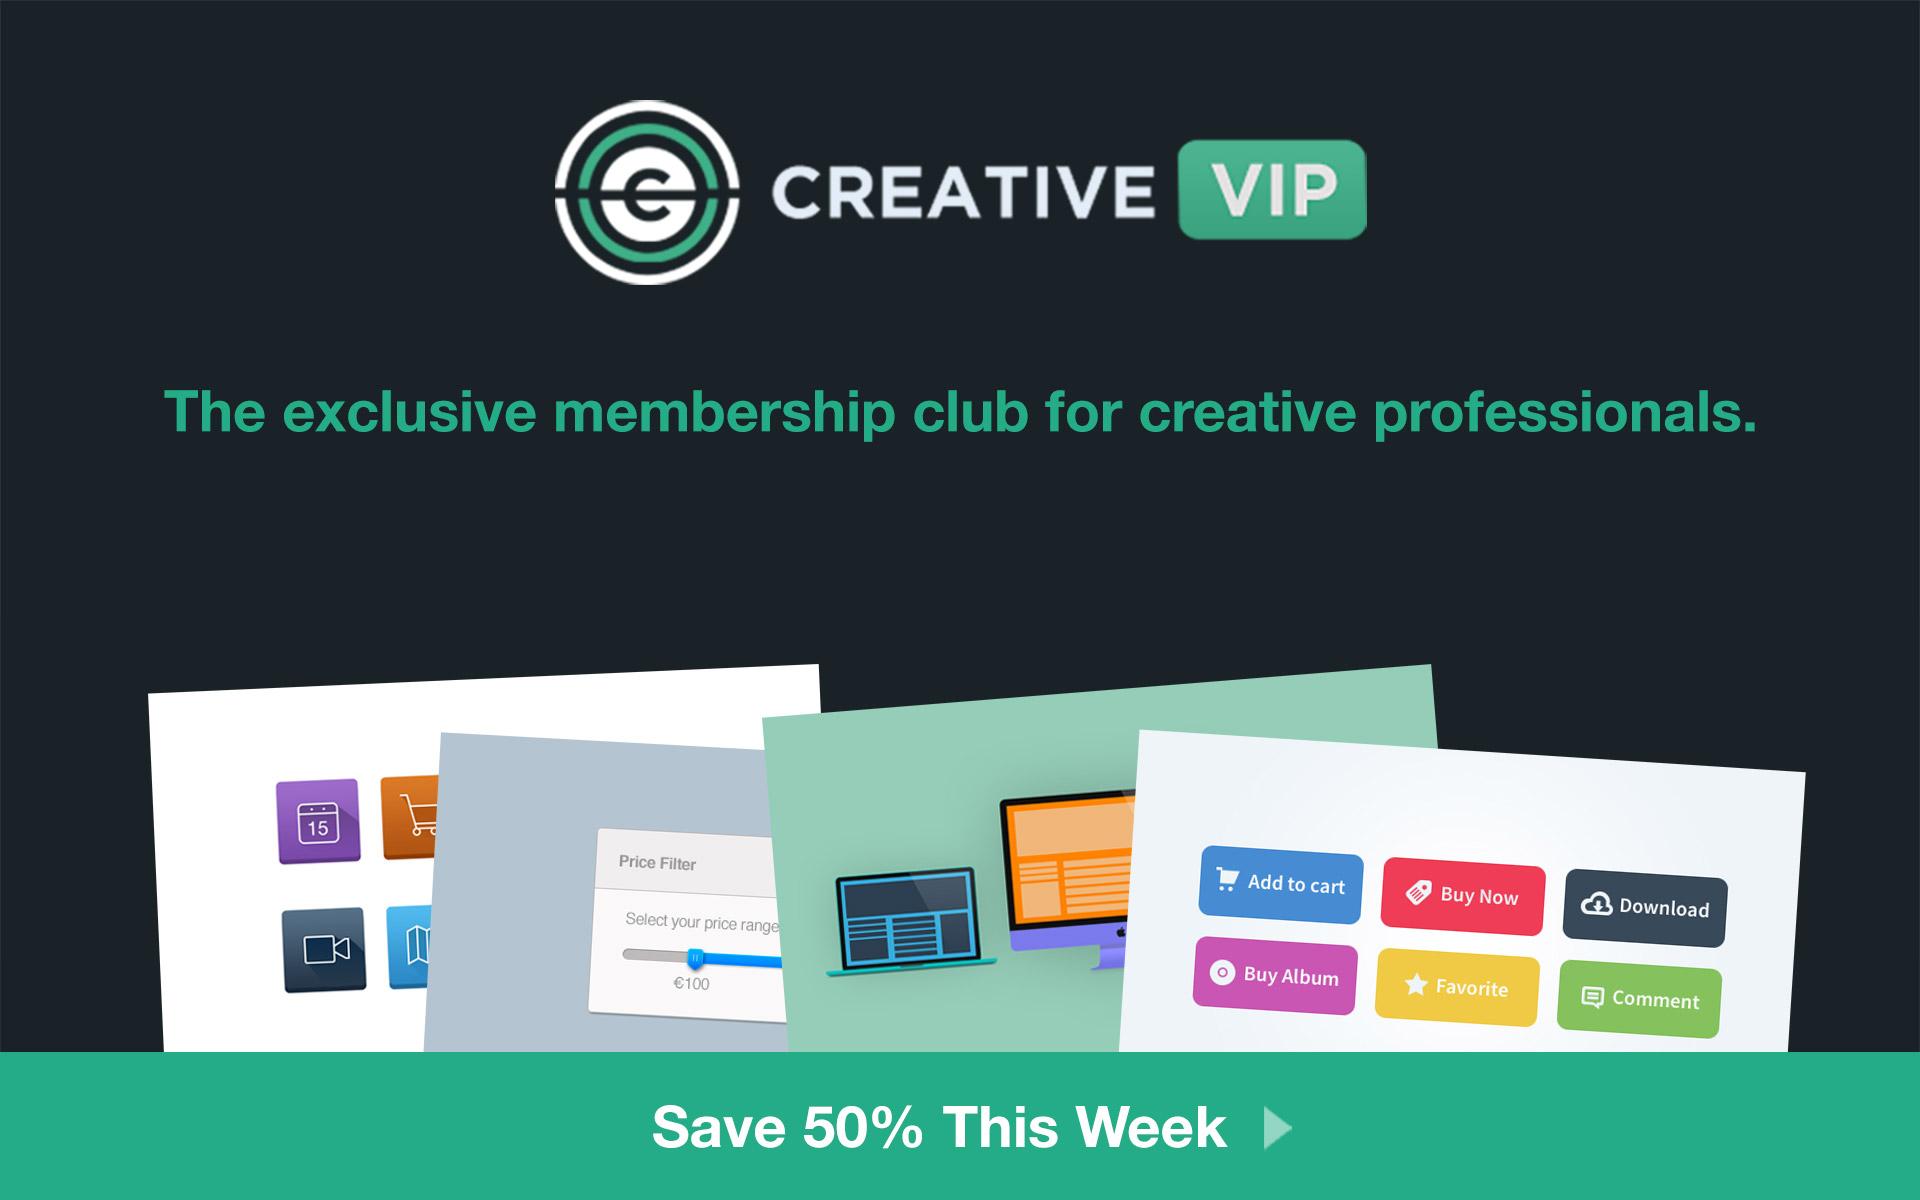 Save 50% on Creative VIP (Sponsor)